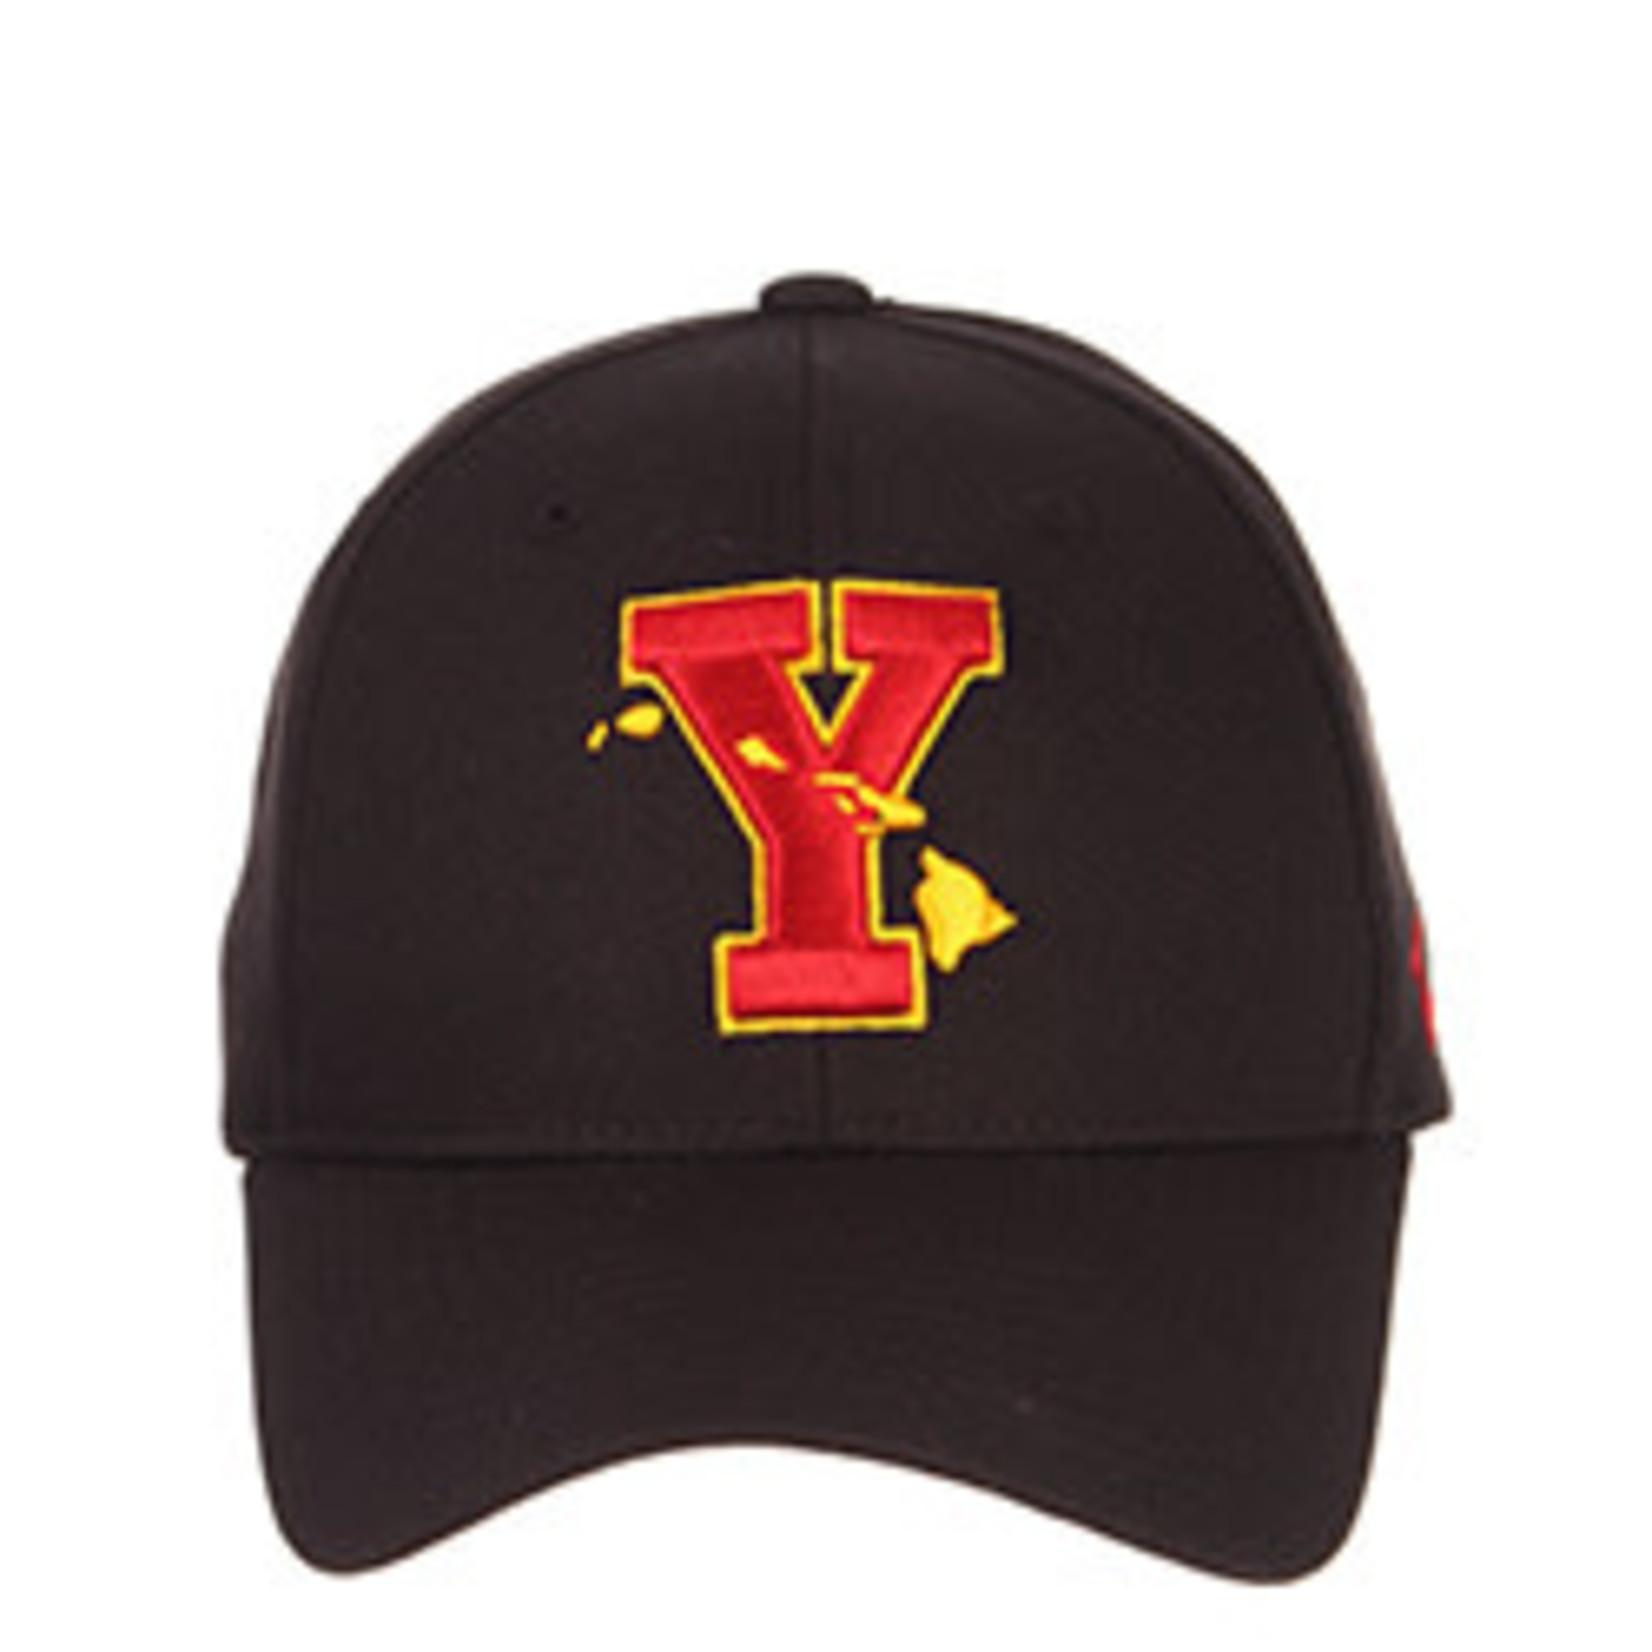 "ZEPHYR ZEPHYR ZHS BLACK M/L ""Y"" ISLANDS"